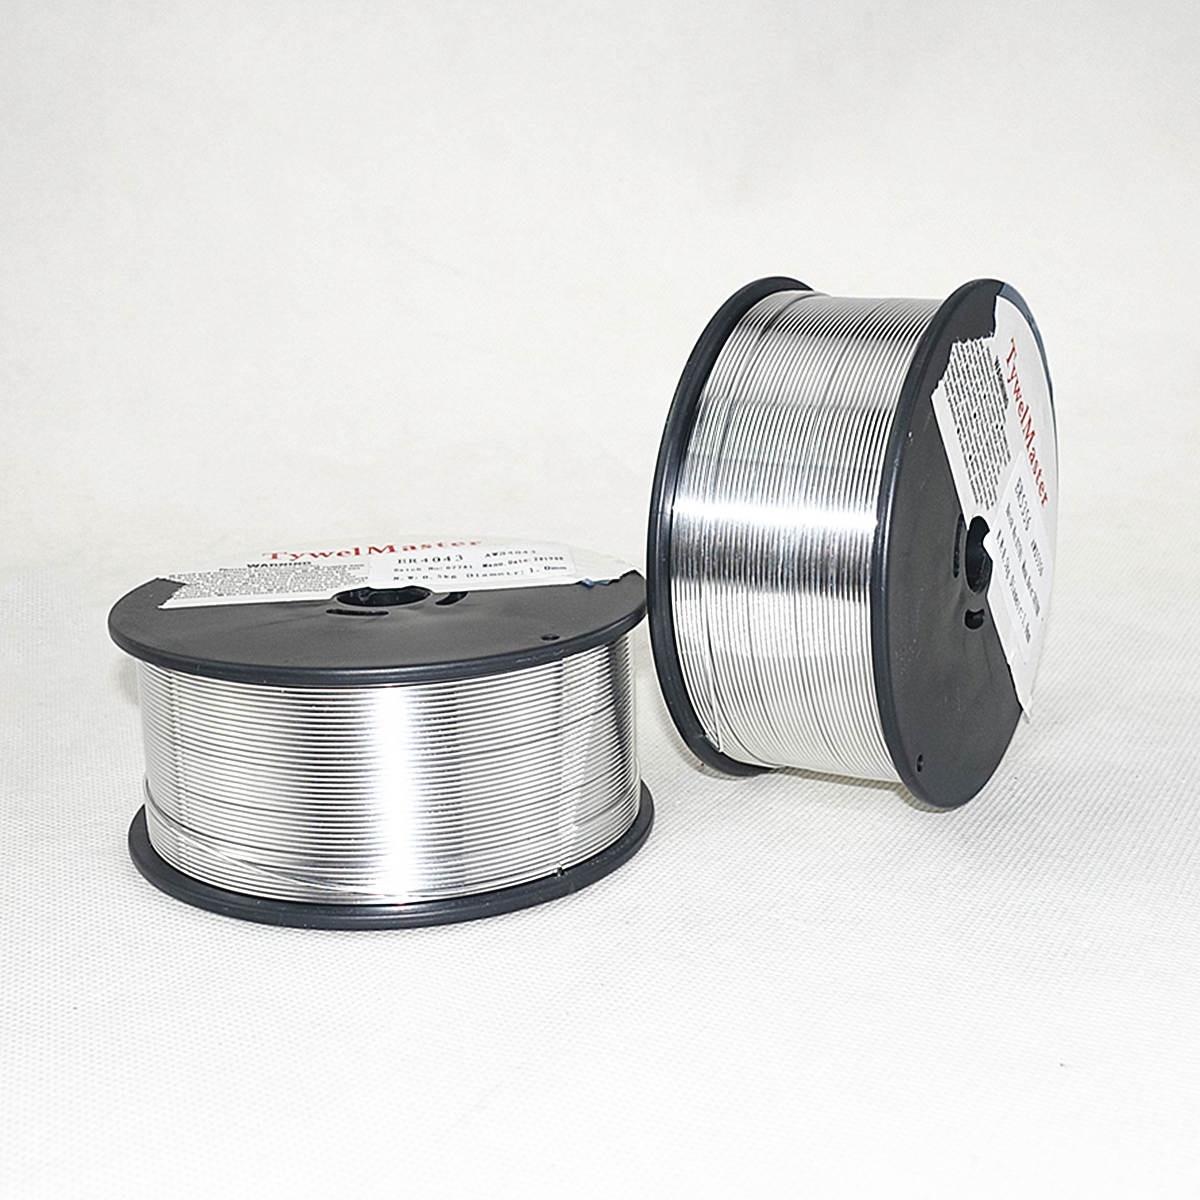 ER5356 SAL5356 Al-Mg Liga de Alumínio Arame de Solda MIG 0.5KG dia 0.8/1.0/1.2mm TIG solda MIG Arame de Solda de Alumínio